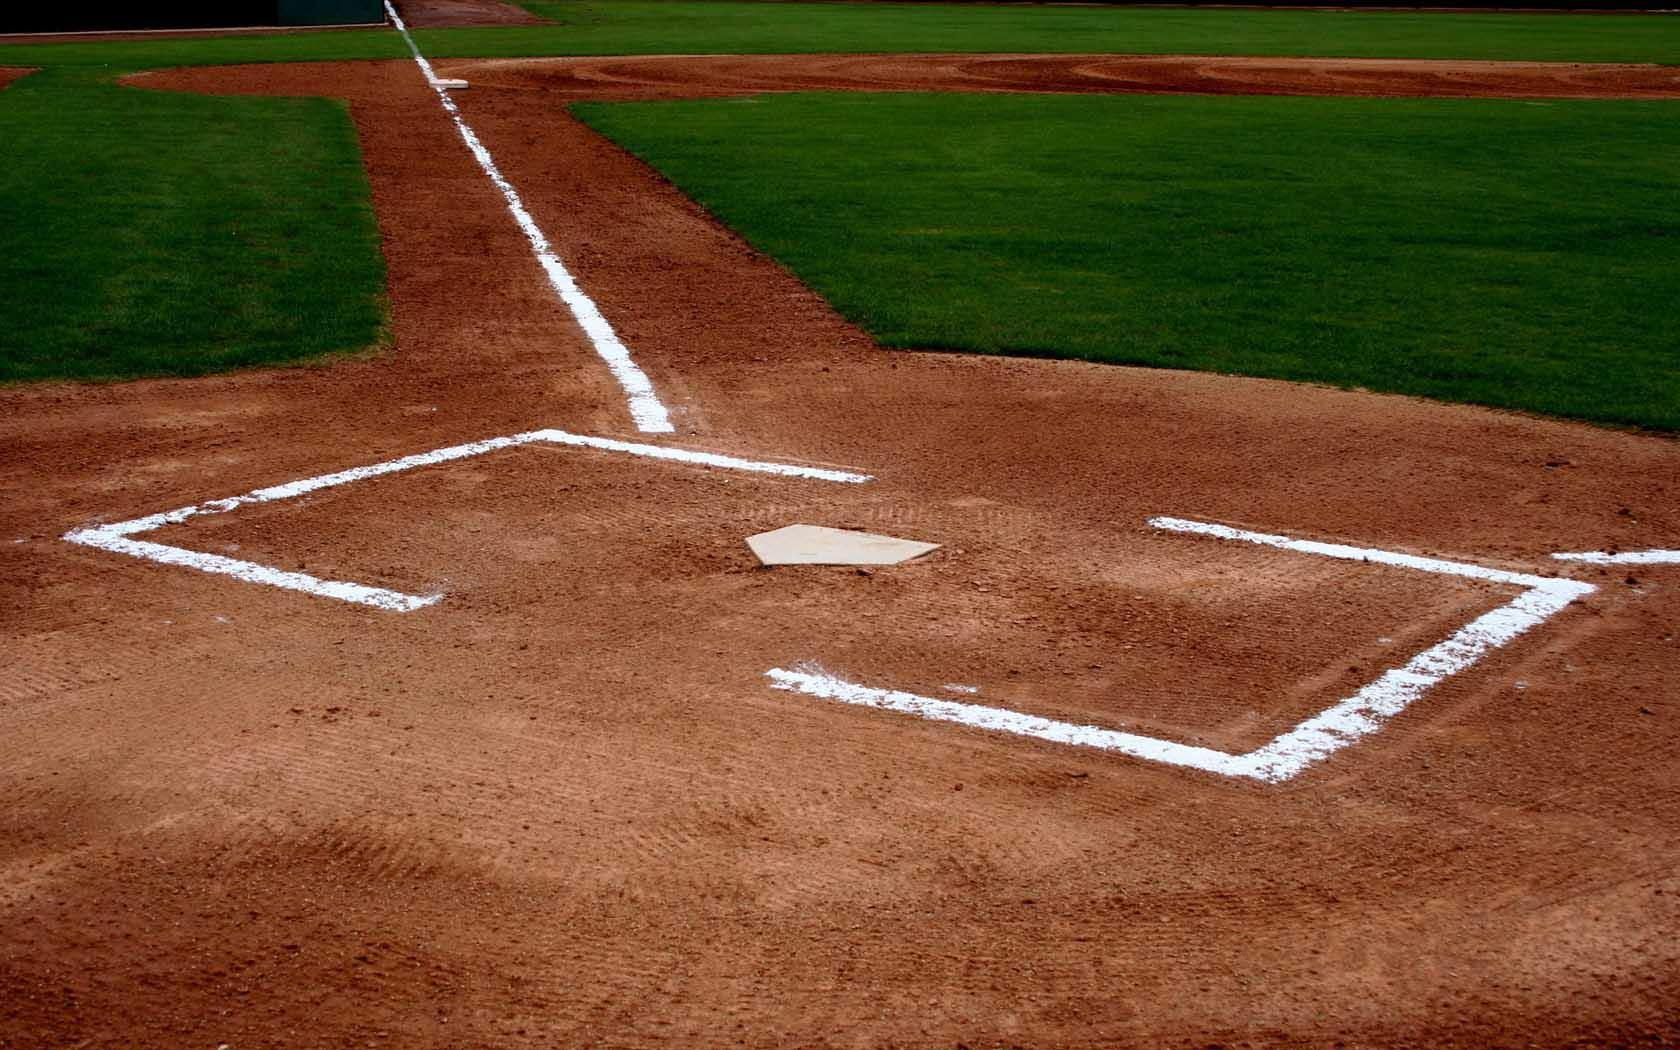 Fame Comes Second But Not First Http Marcguberti Com Baseball Field Baseball Wallpaper Baseball